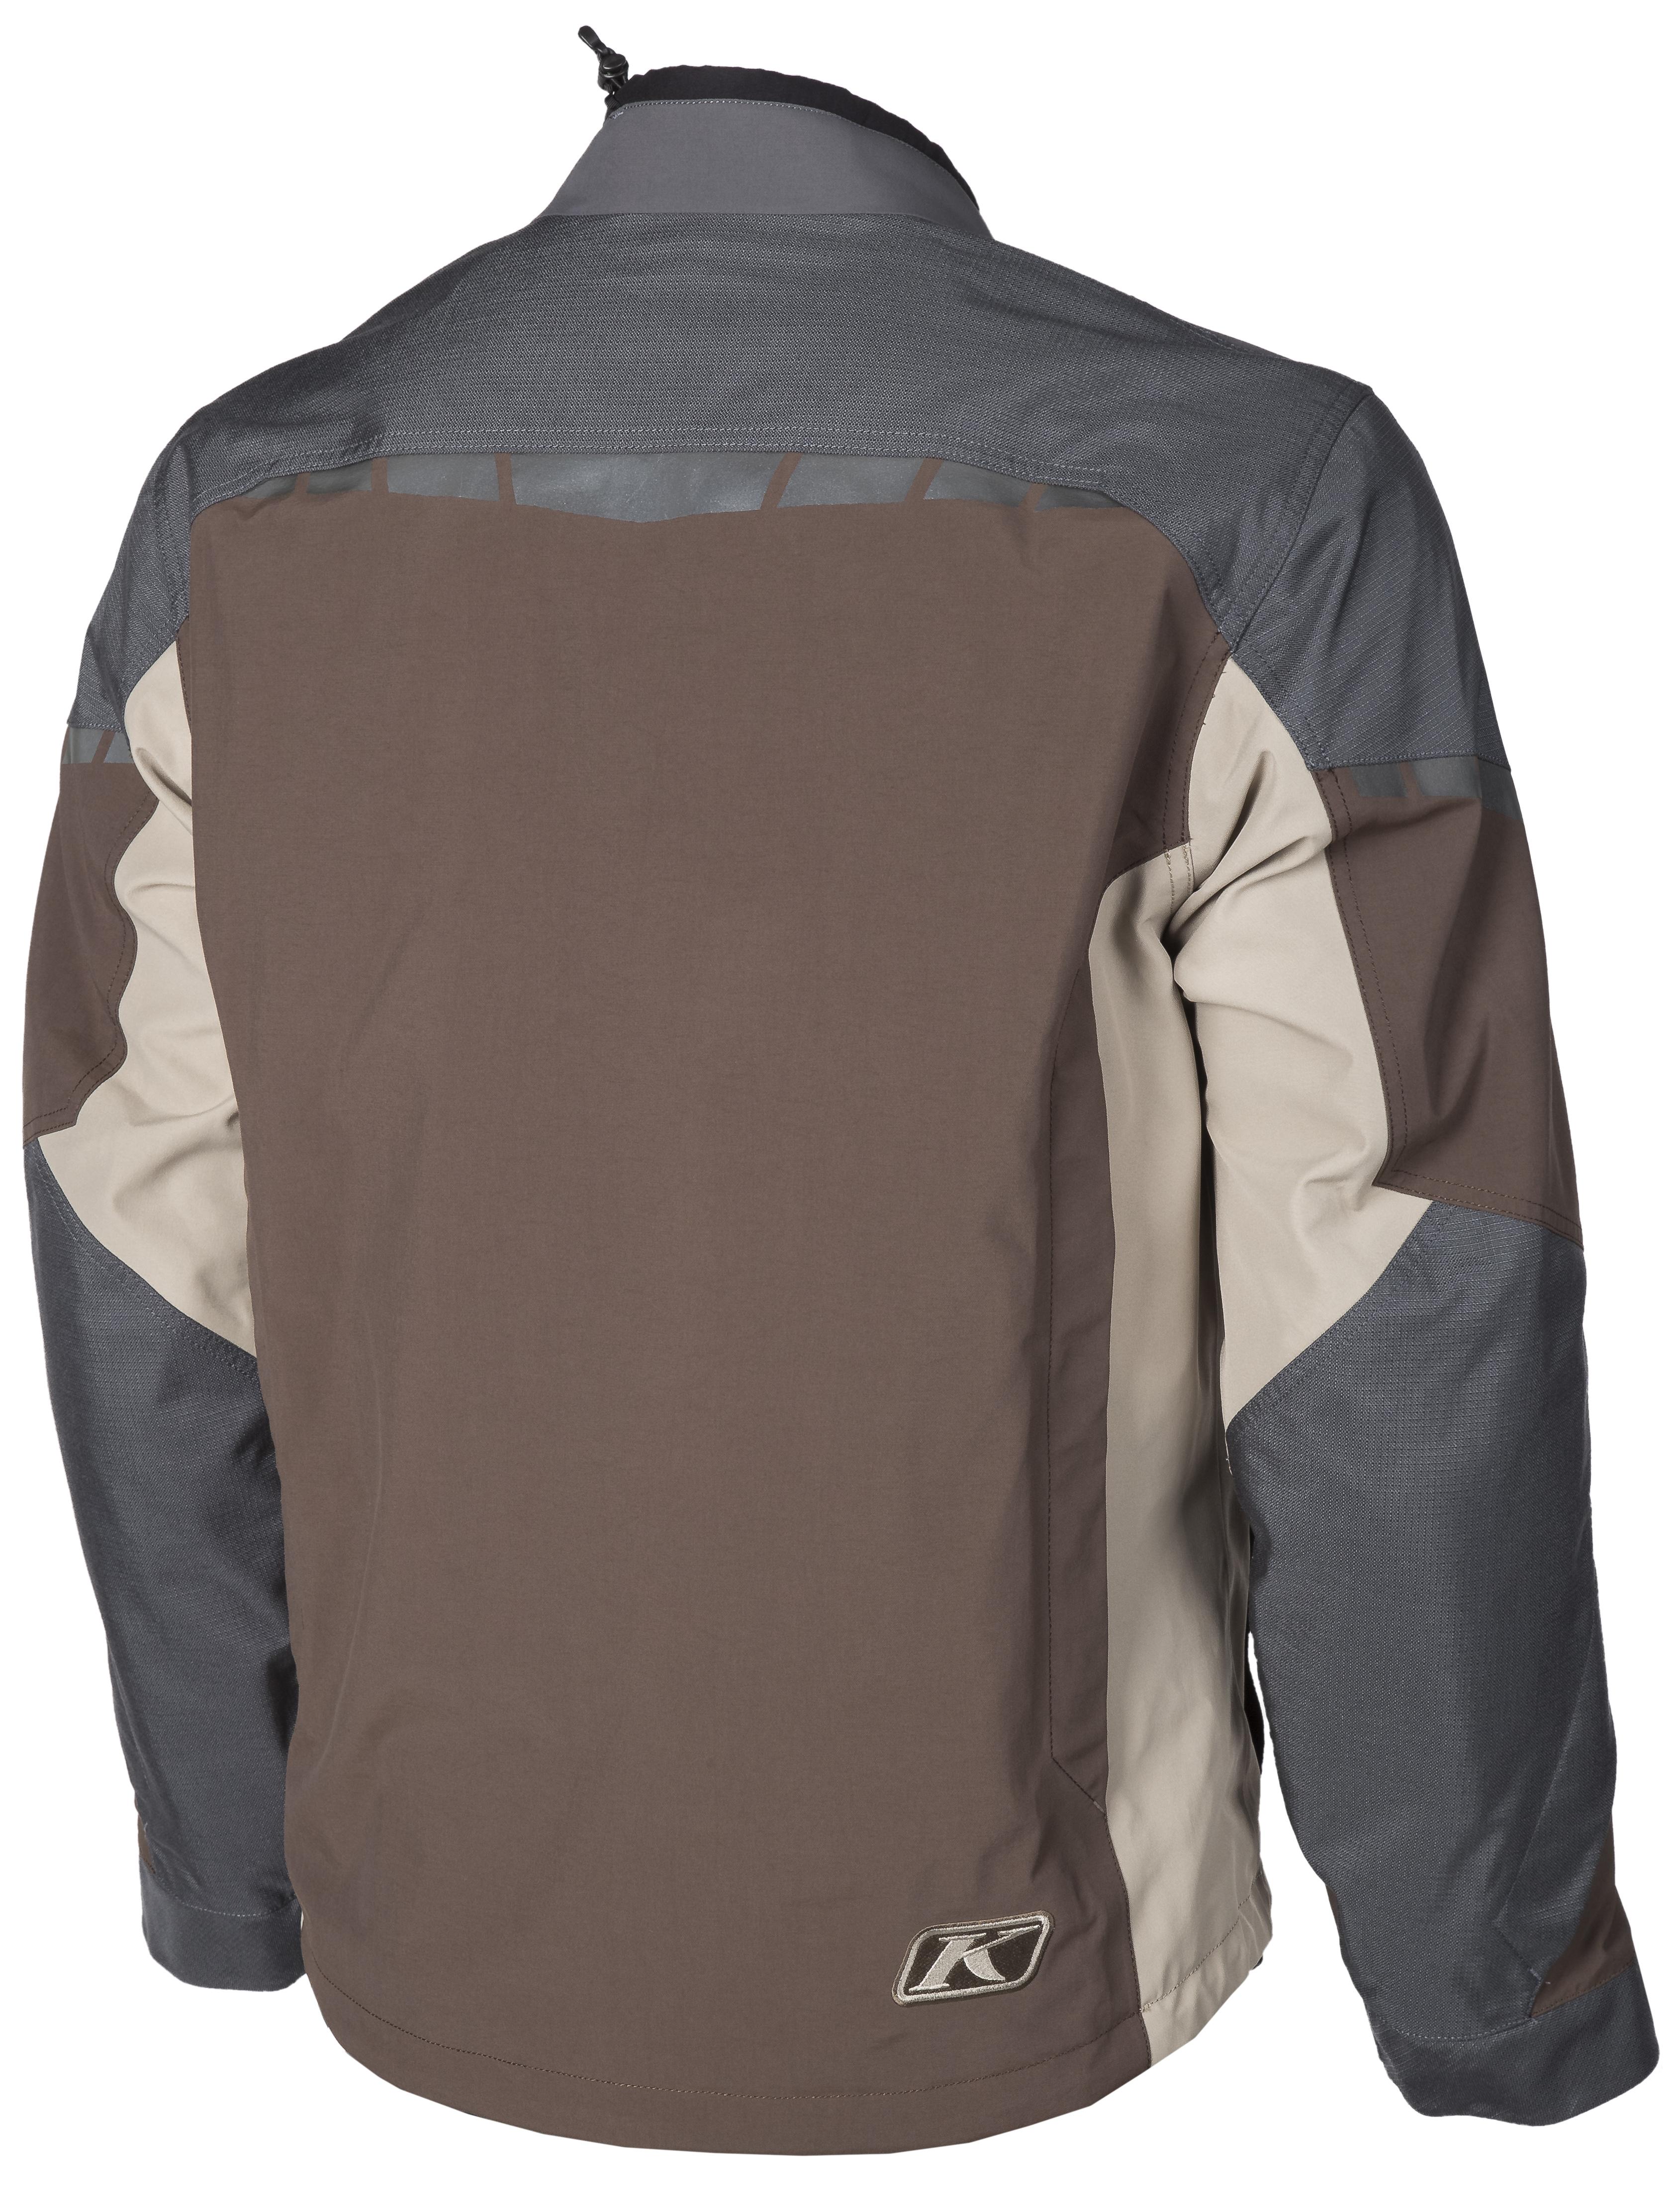 6029-001-900 Carlsbad Jacket D1